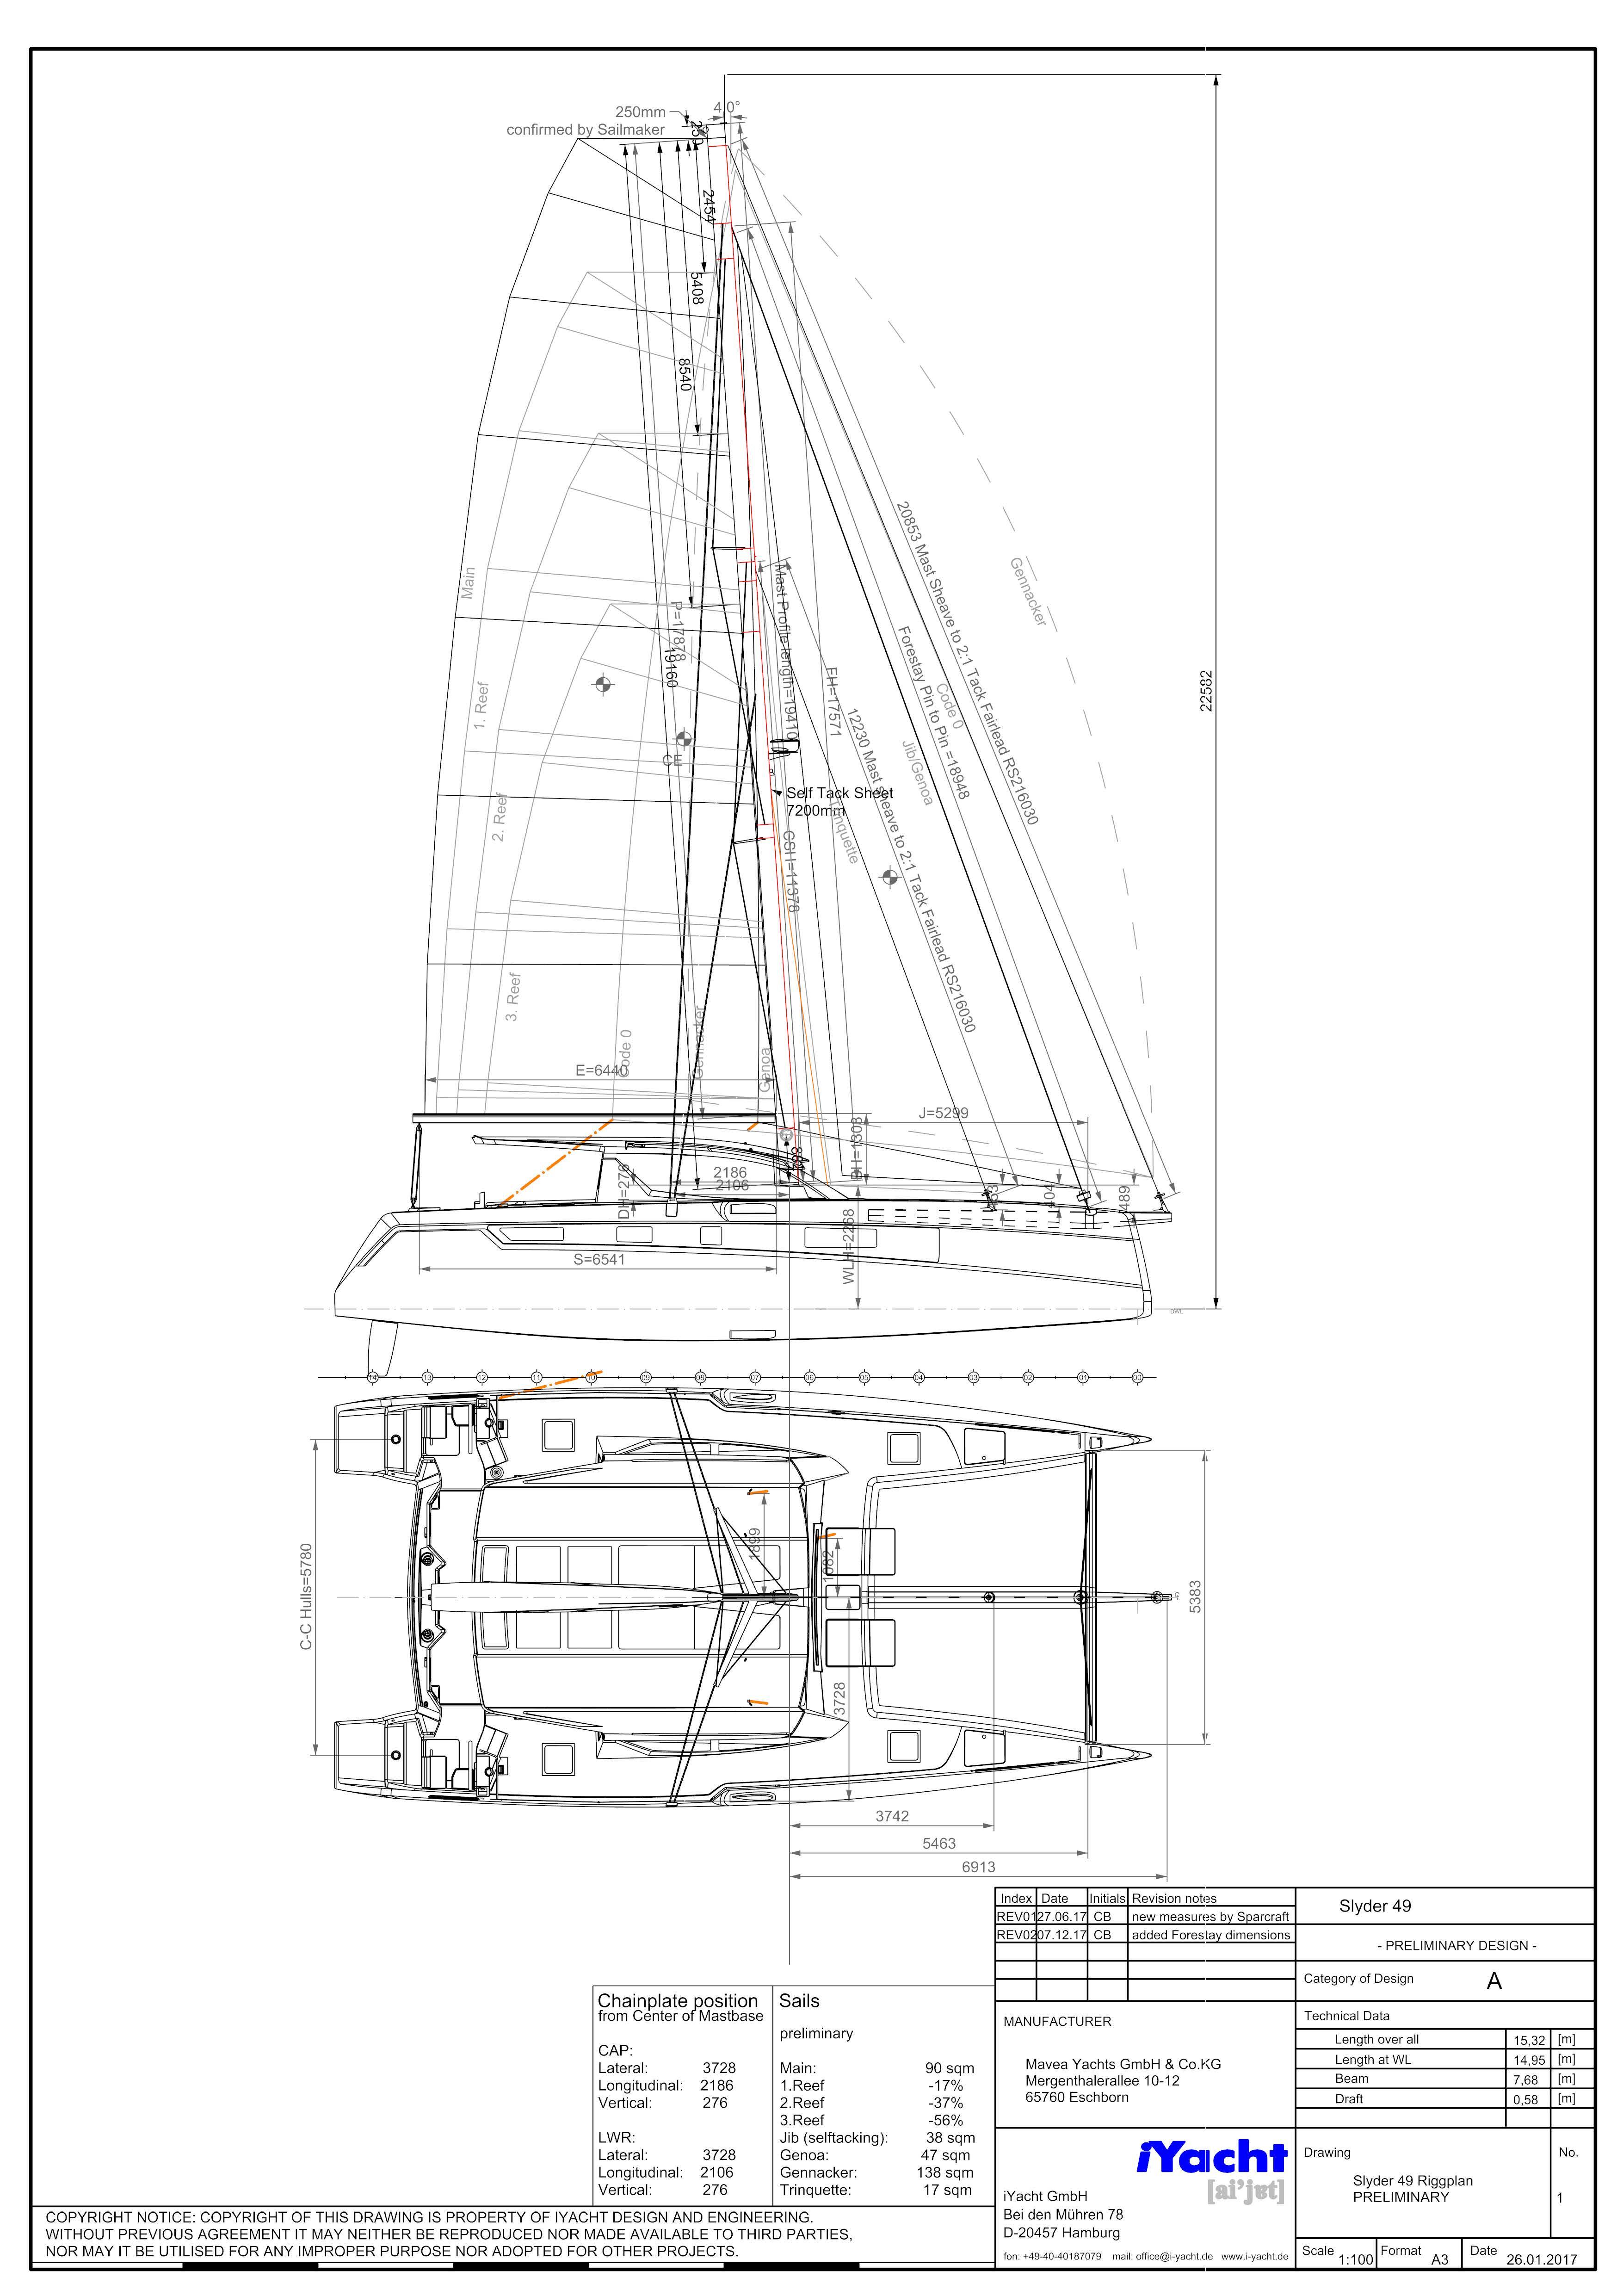 Slyder 49 Riggplan REV02 Boat#1